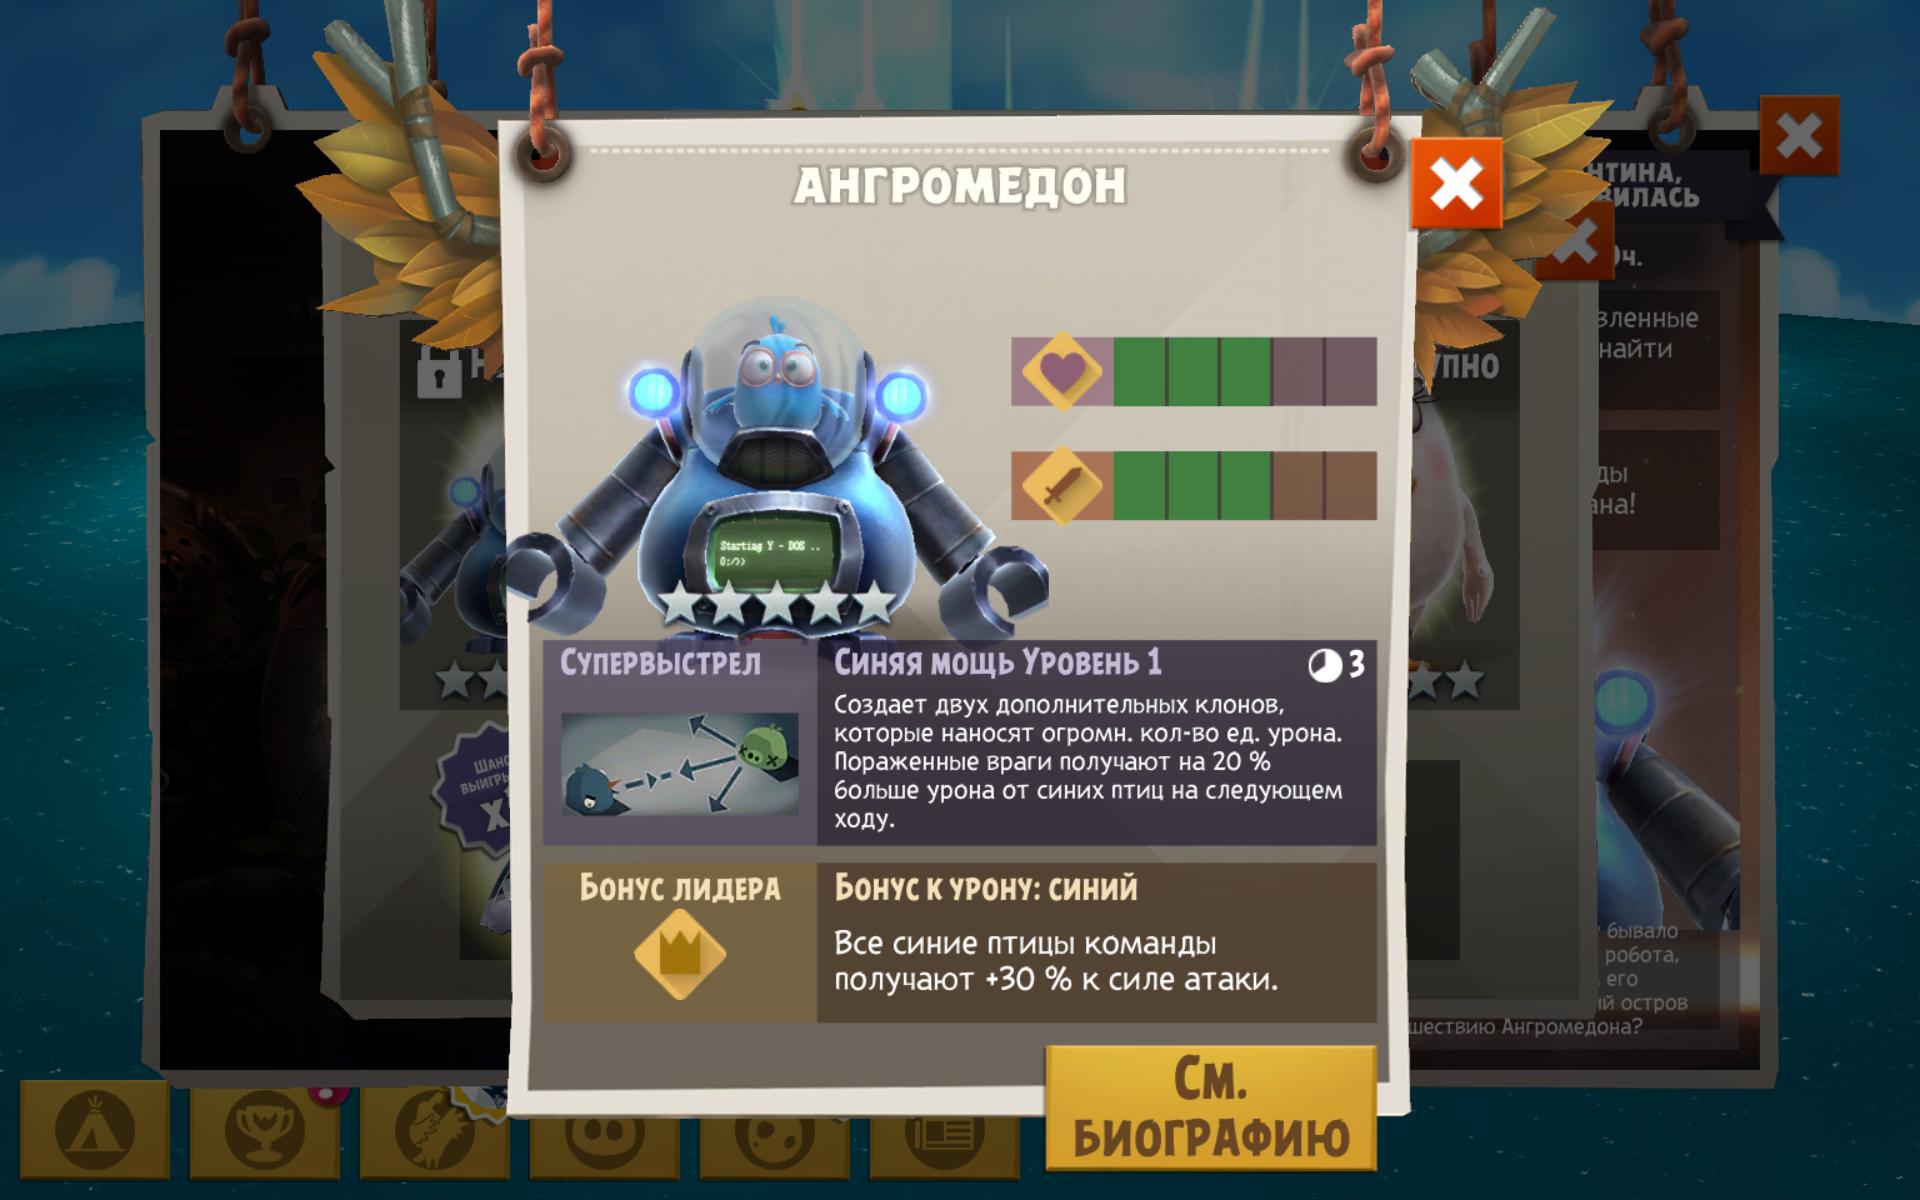 Ангромедон